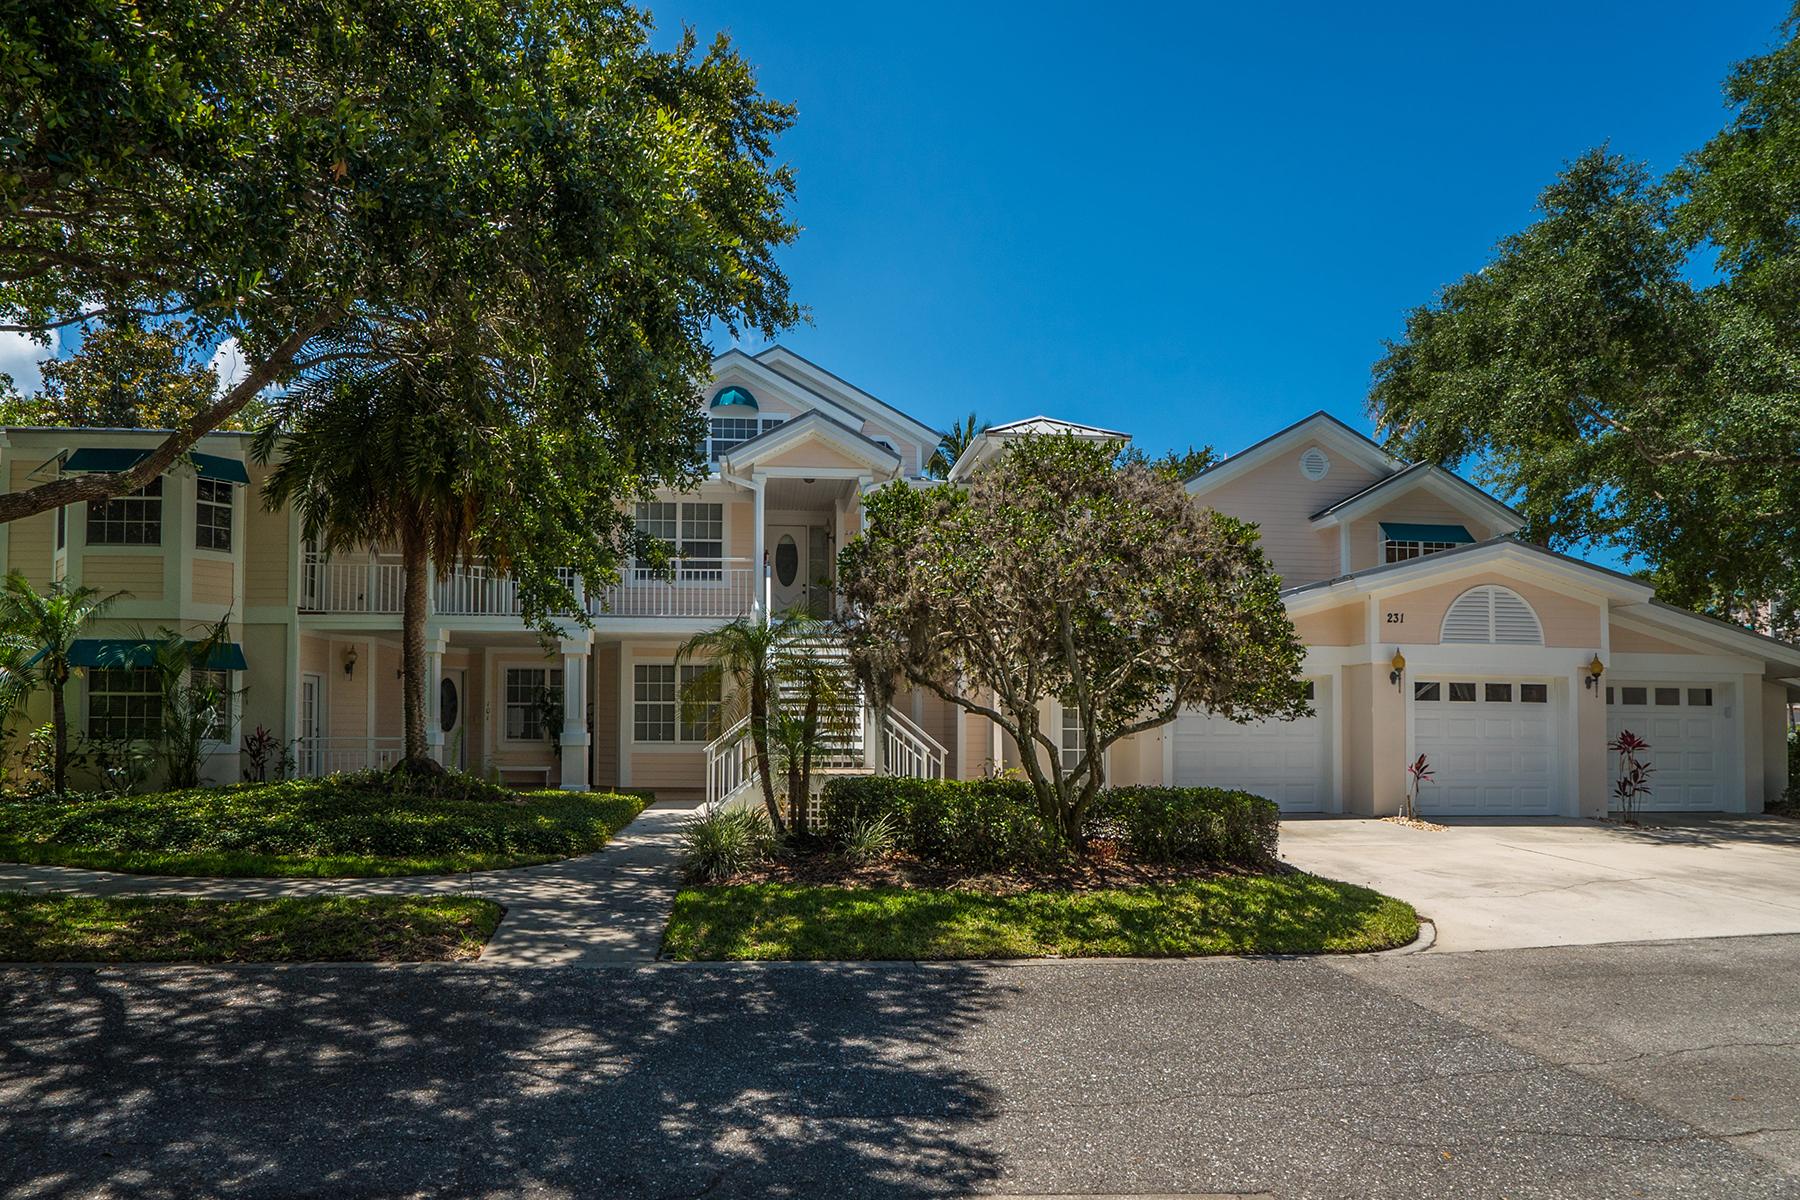 Condominium for Sale at HIDDEN BAY - OSPREY 231 N Hidden Bay Dr 201 Osprey, Florida, 34229 United States